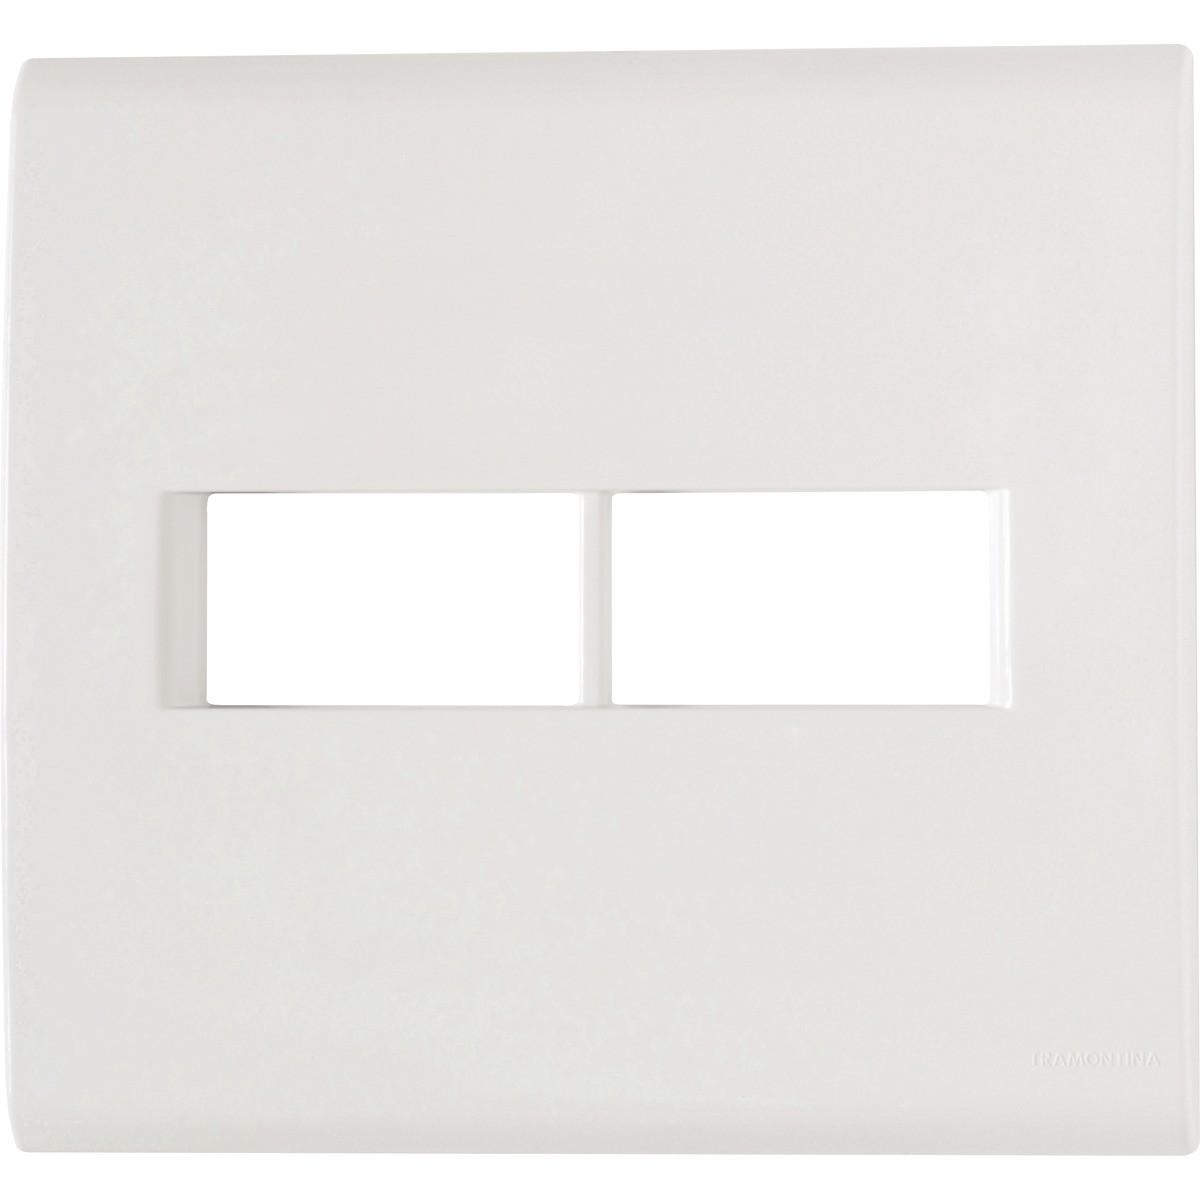 Placa 2 Postos - 4x4 - Tramontina